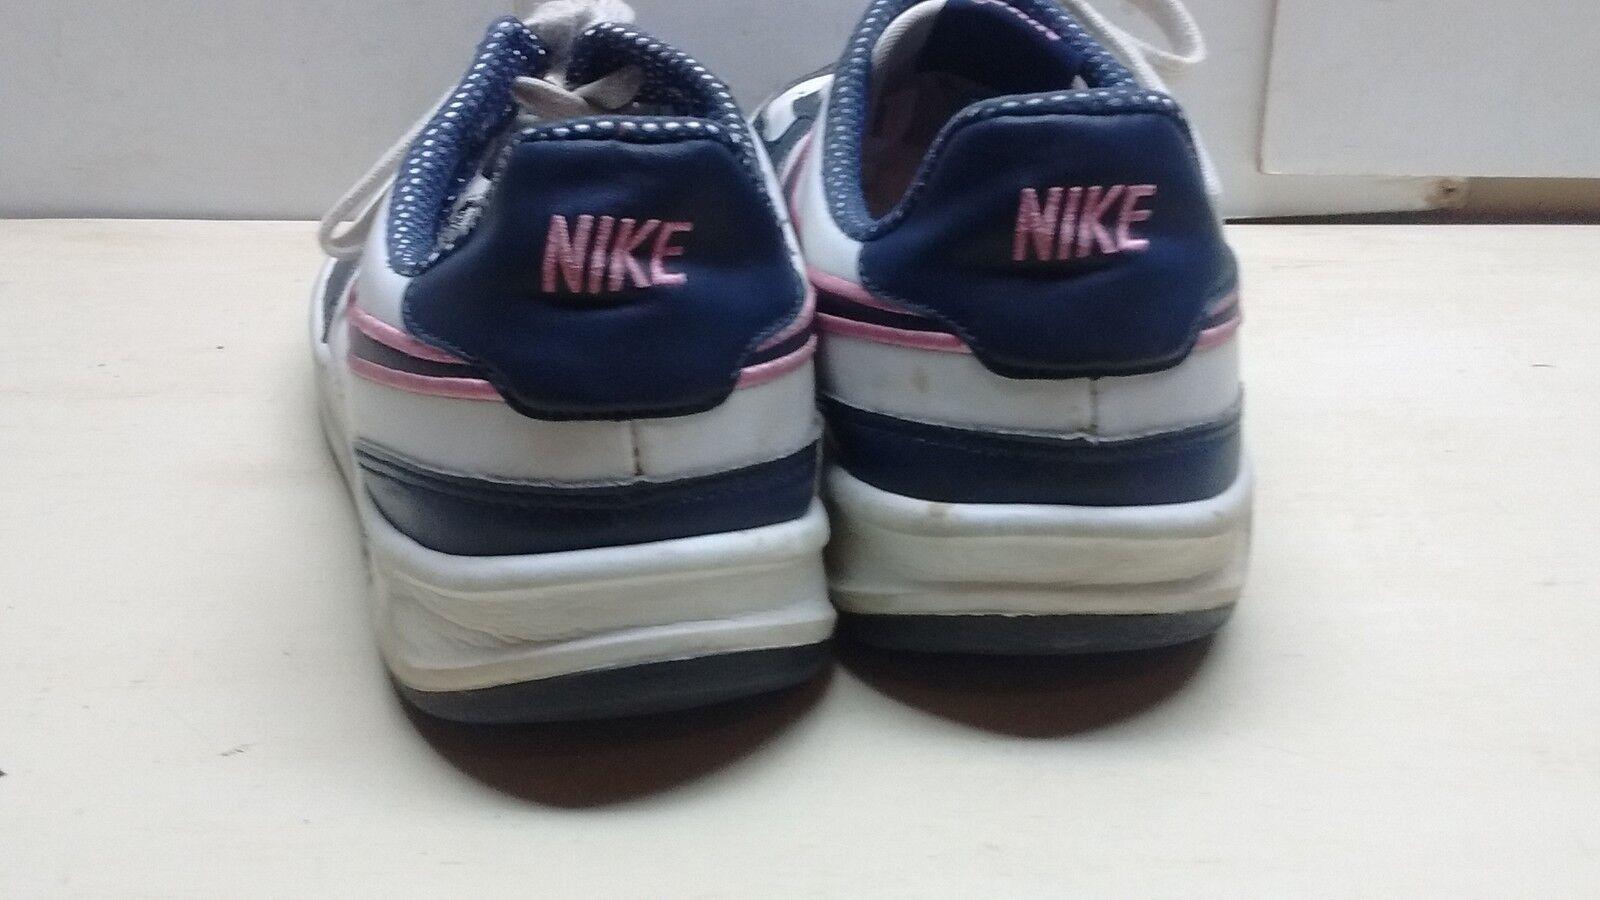 Nike ace 83  11.5m - blau vintage athletic walking sport sneaker schuh 11.5m  44 b23f0e